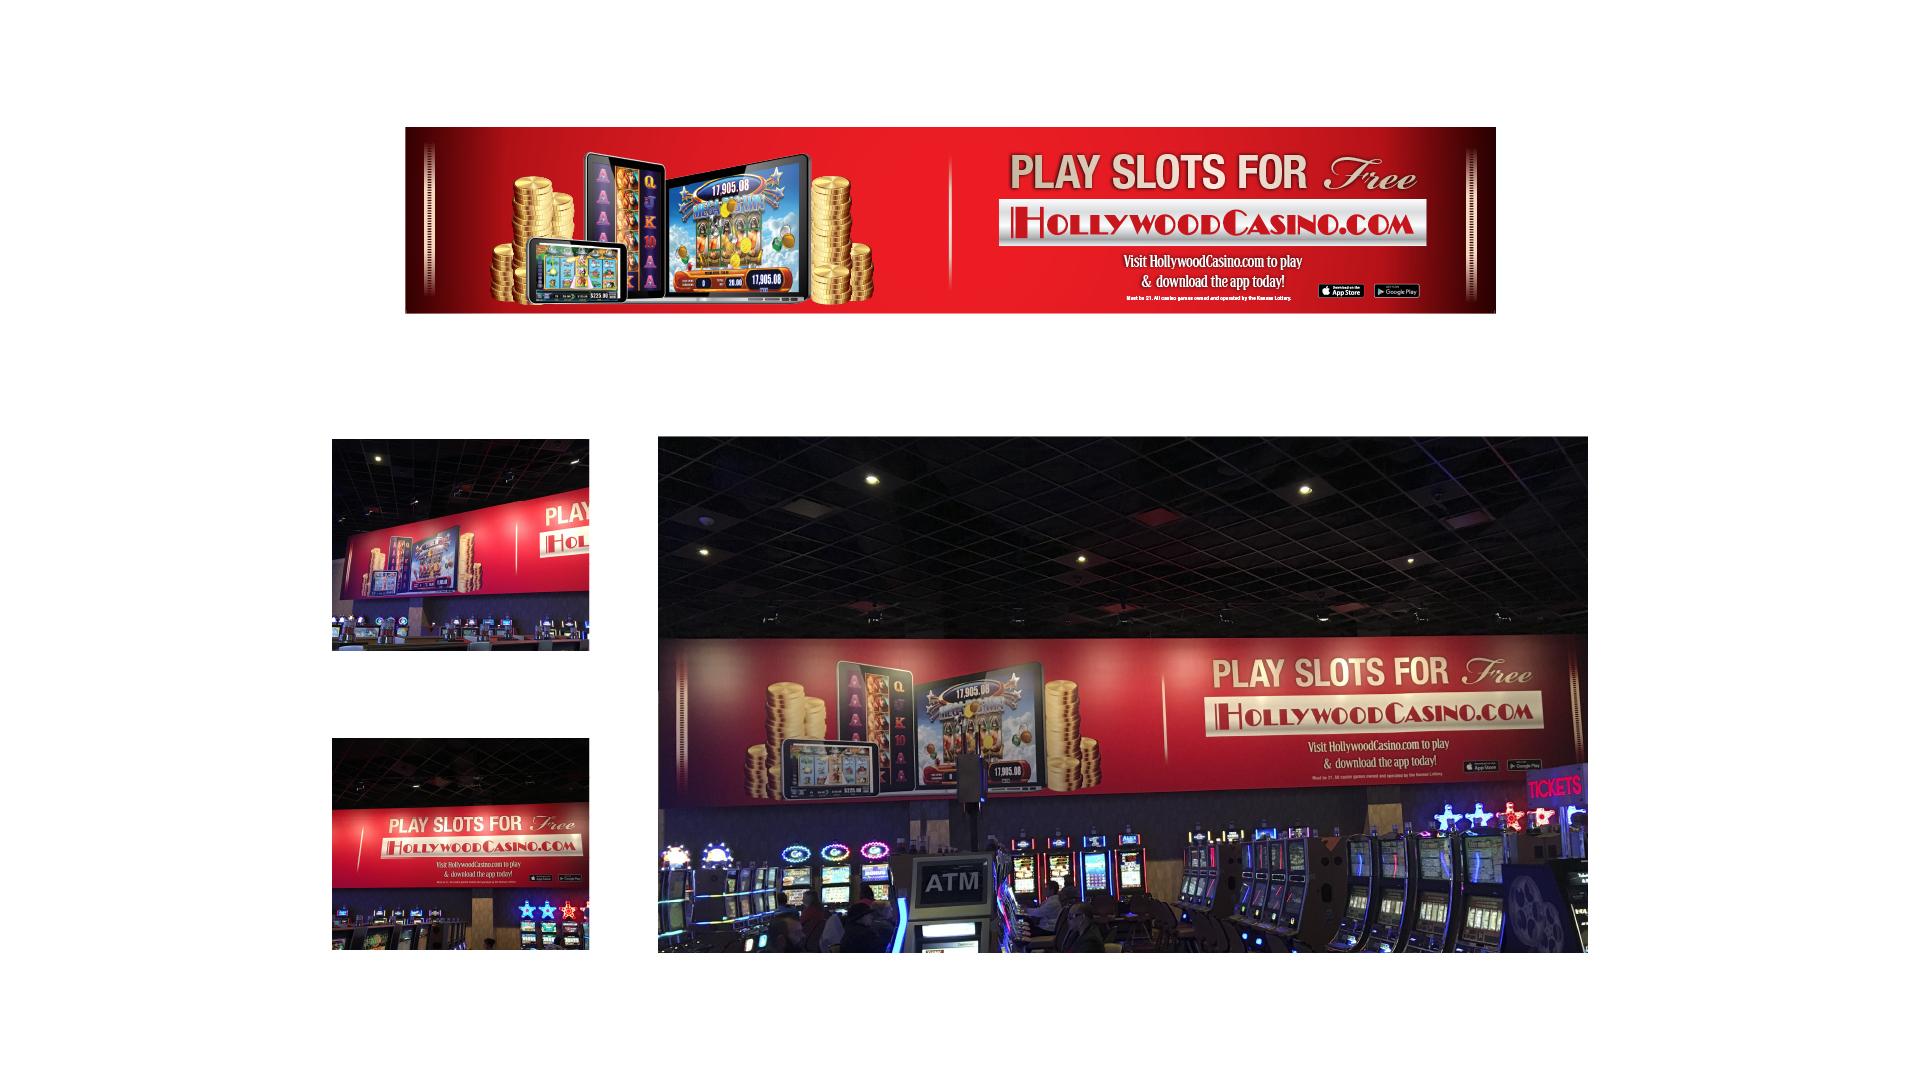 Hollywood Casino Online Billboard